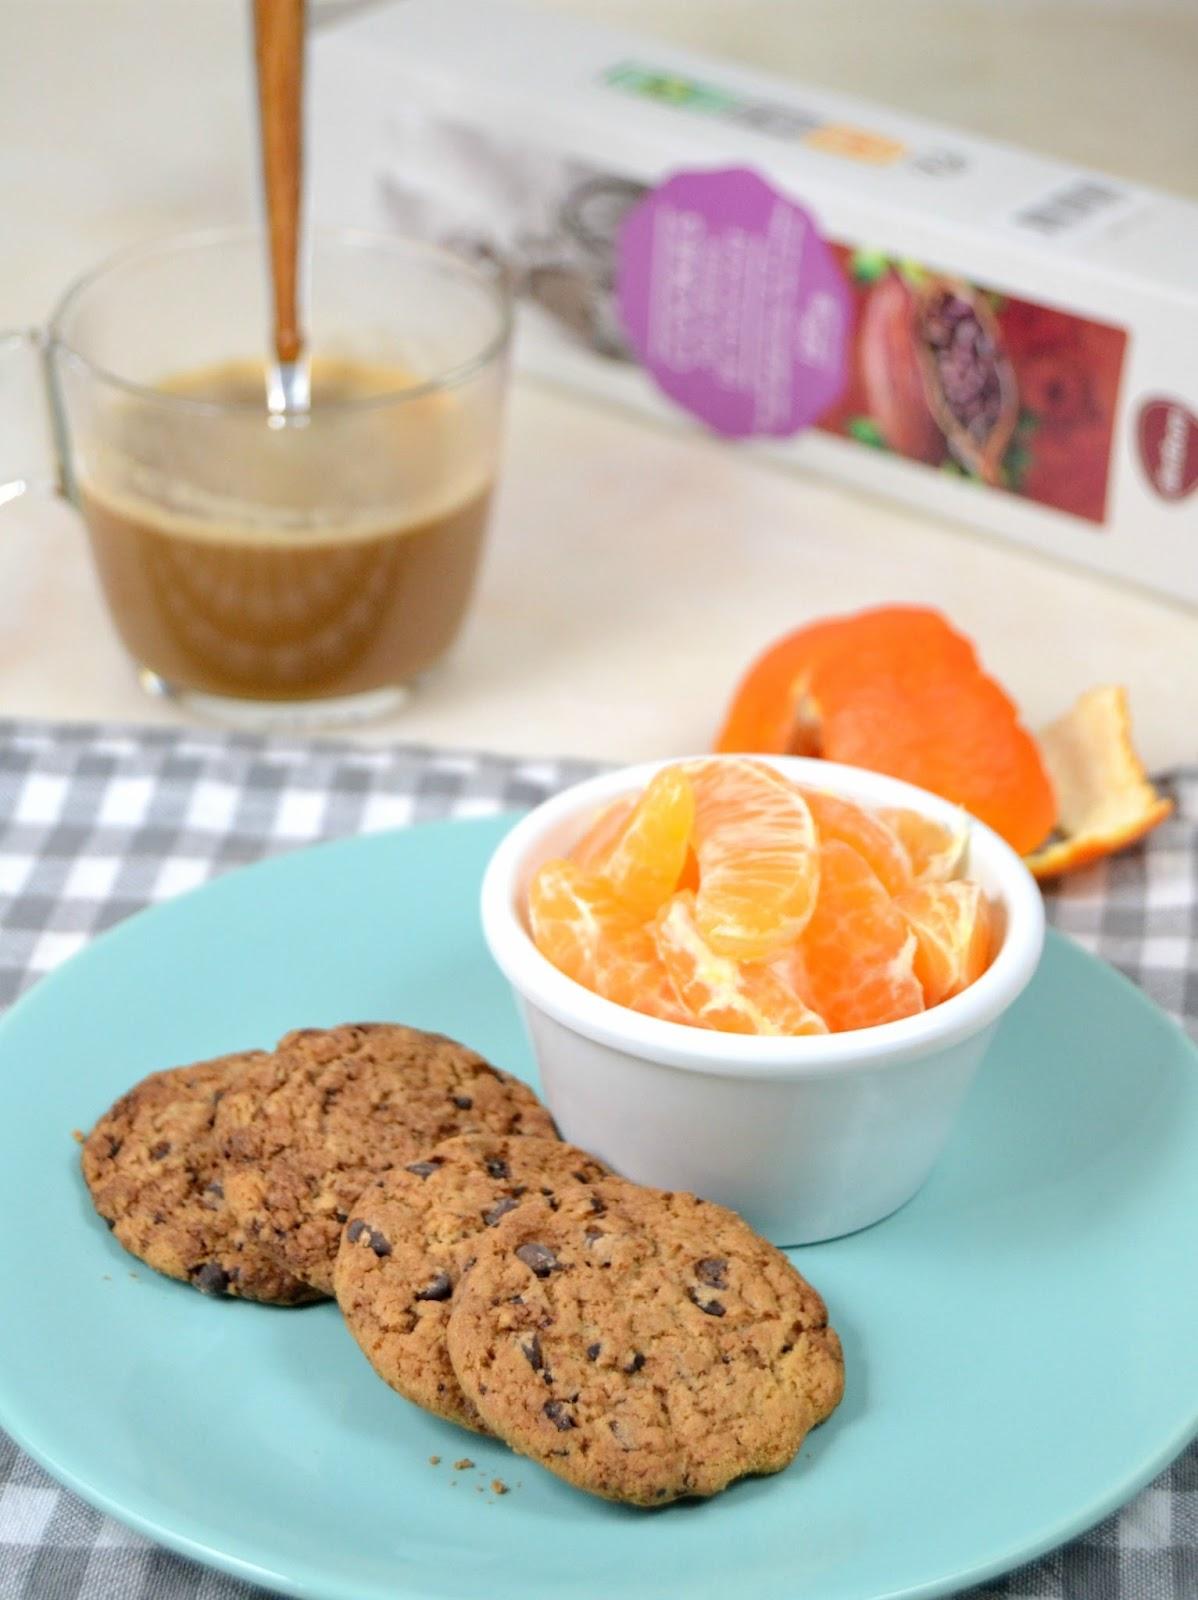 Dietbon, adelgaza de forma sana | Cuuking! Recetas de cocina